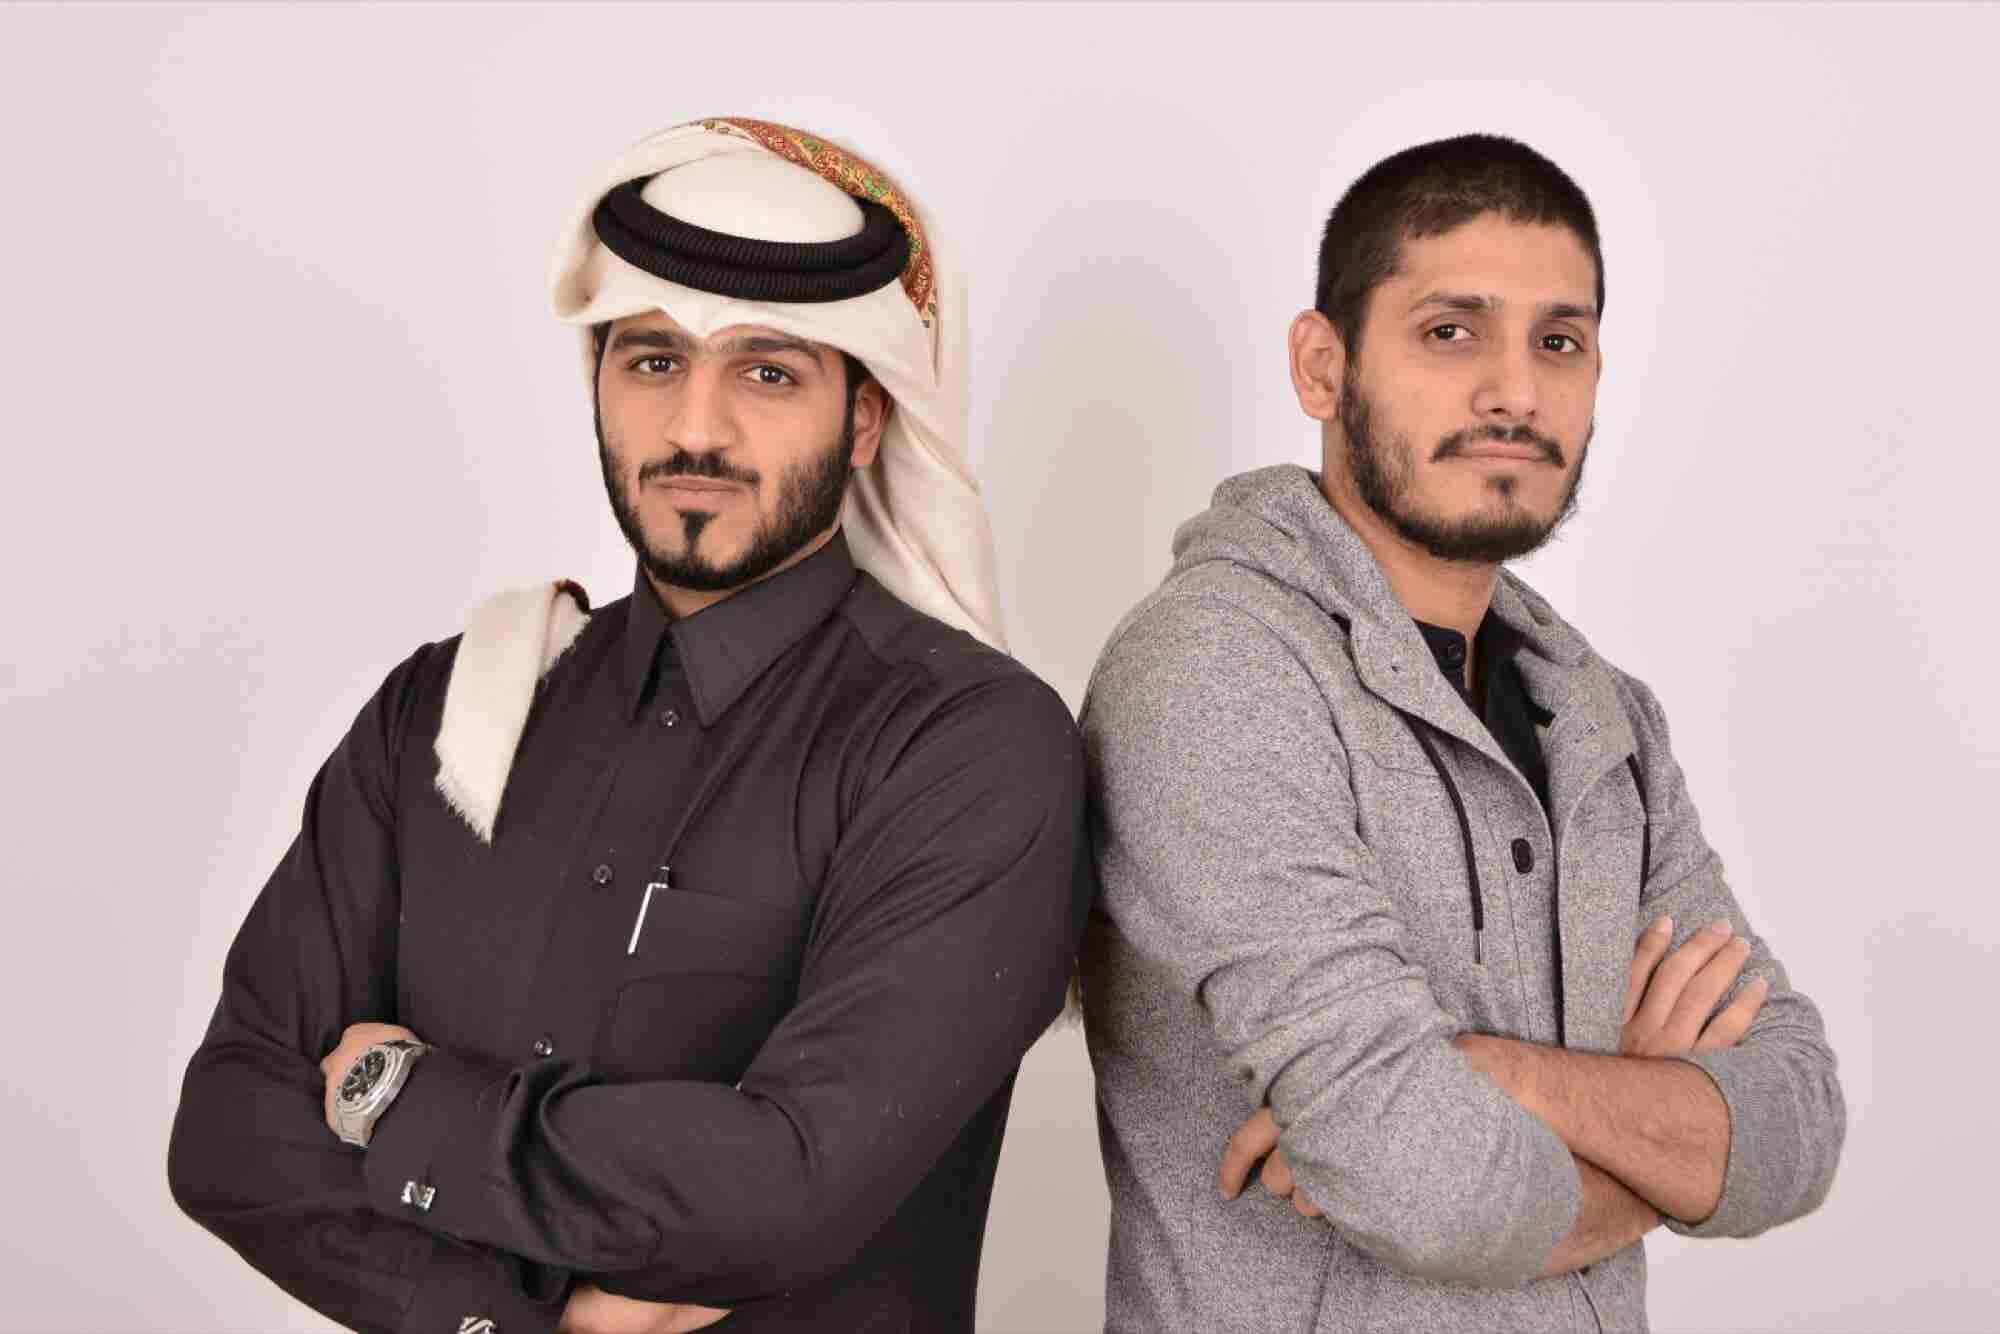 Meddy Co-Founders Abdulla AlKhenji And Haris Aghadi Bring Qatar's Physicians Online